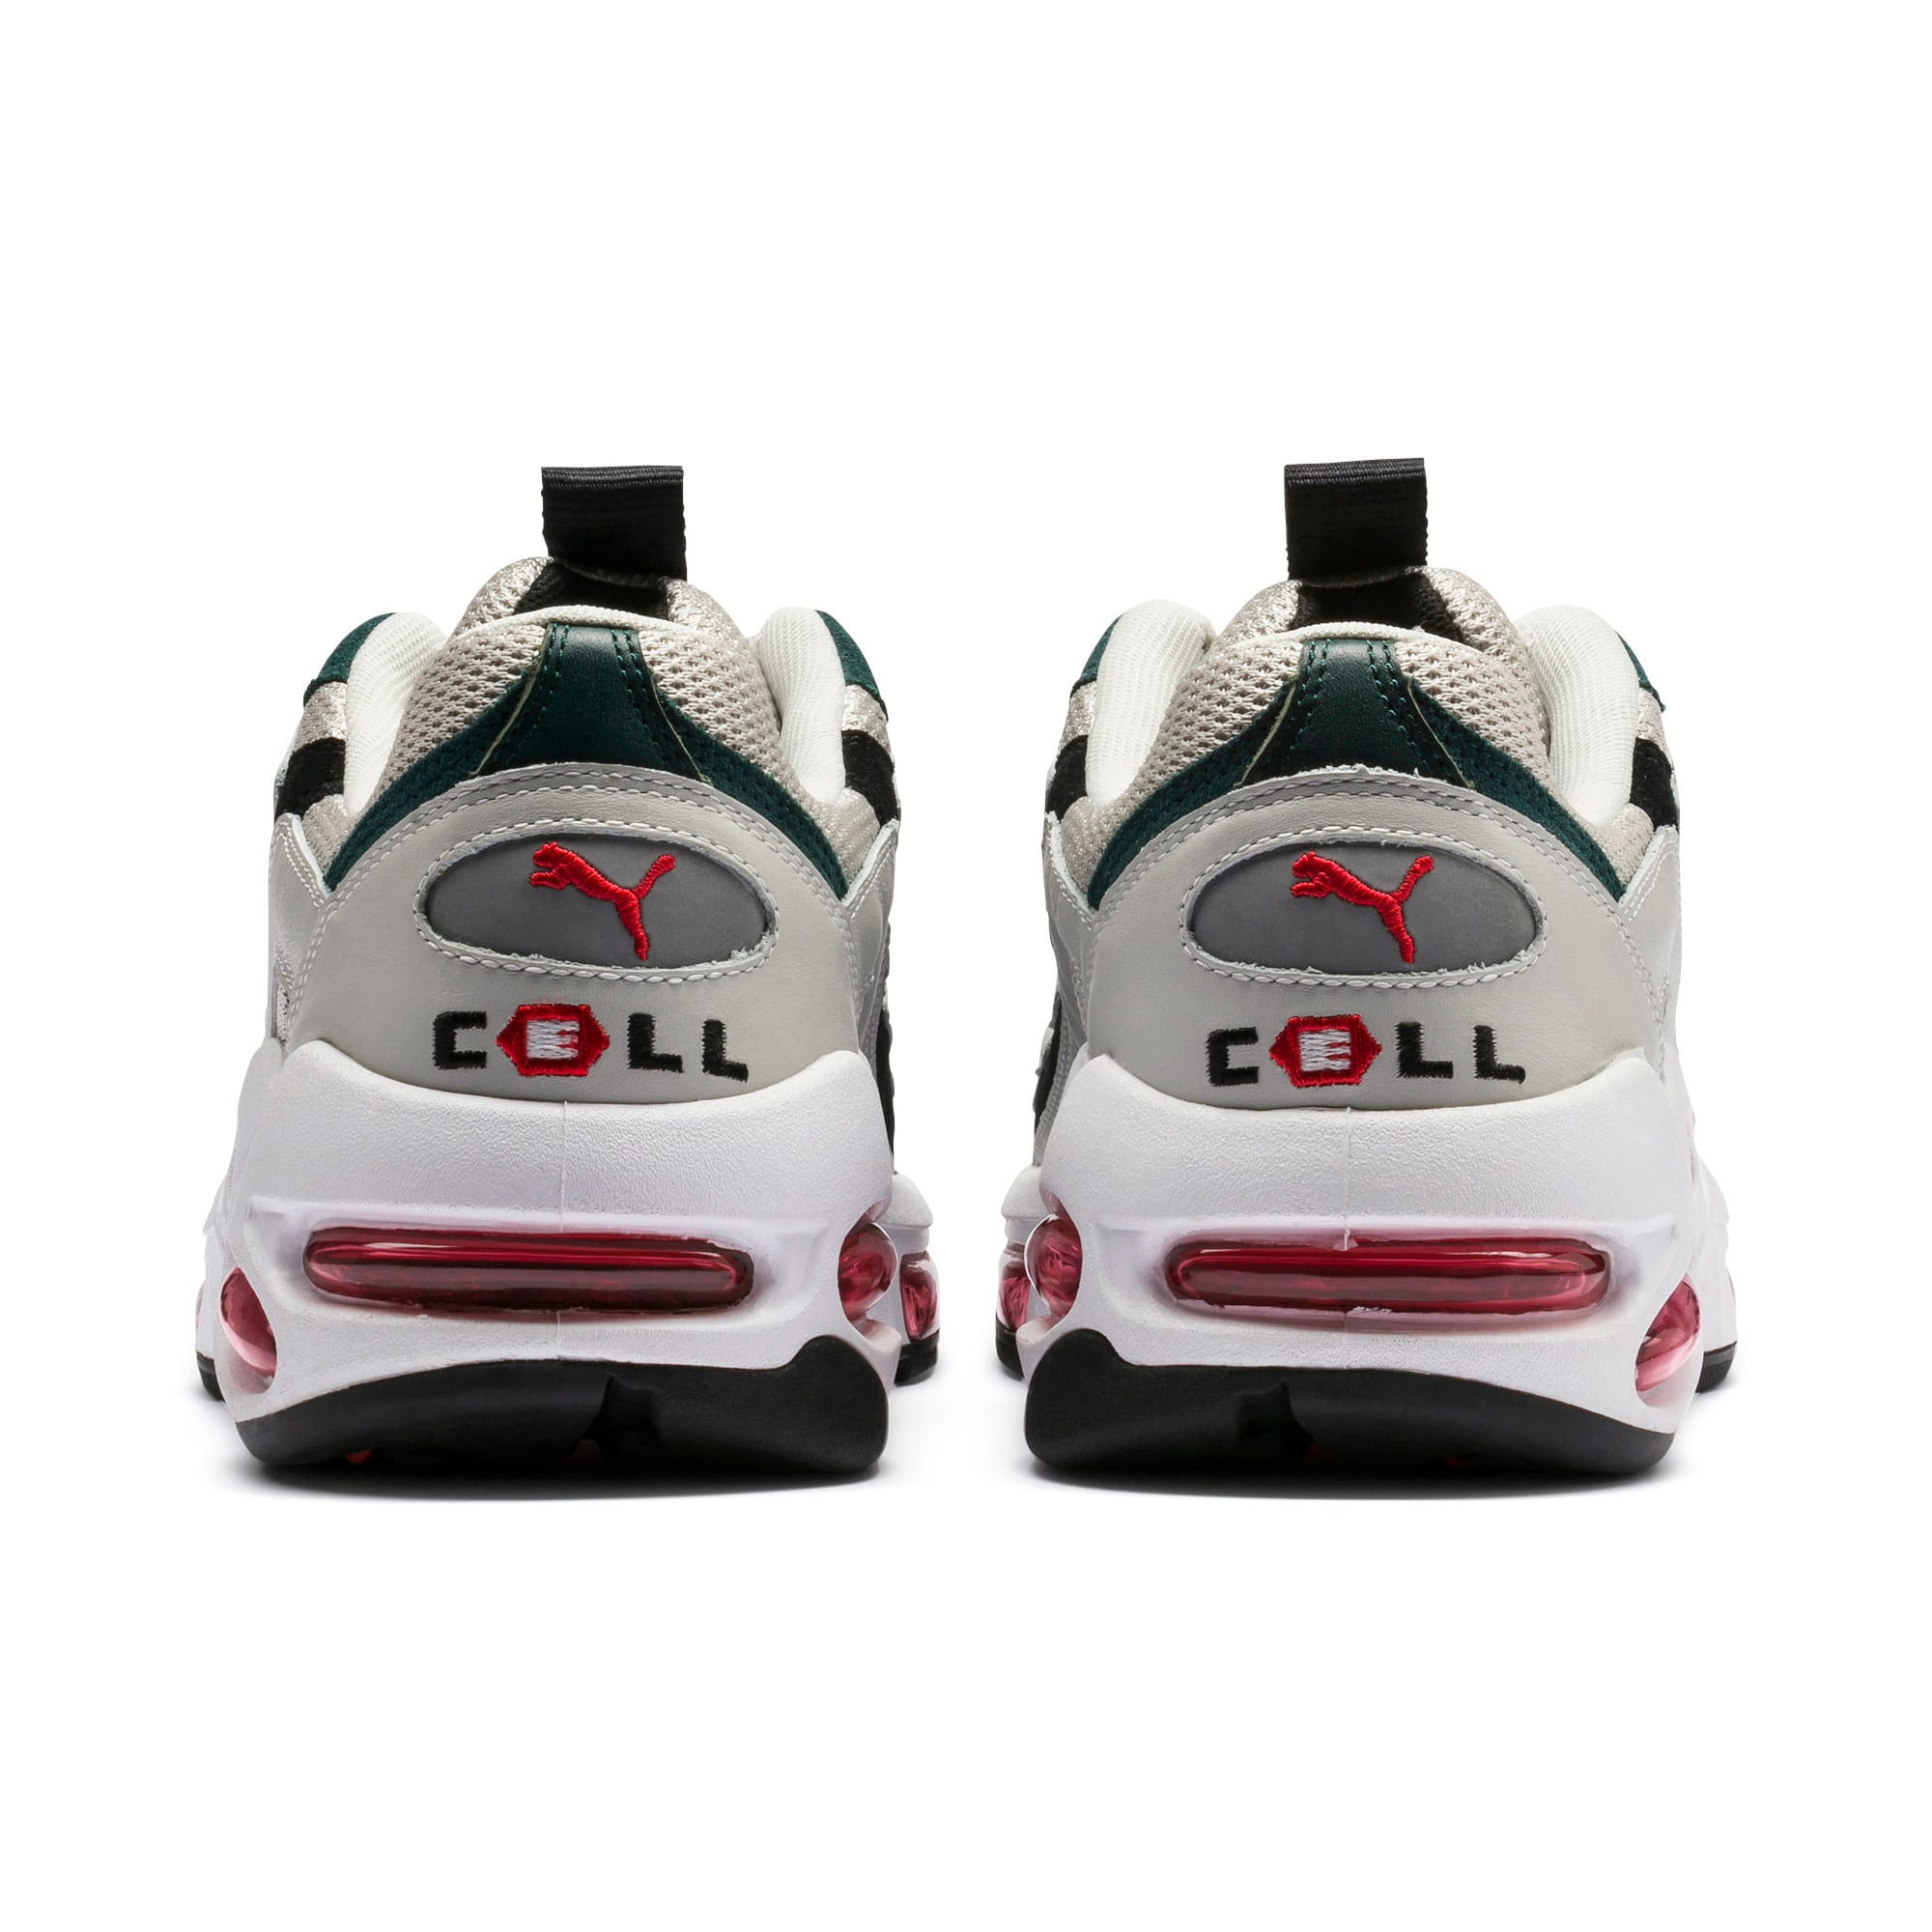 Thumbnail 4 of CELL Endura Sneakers, Glacier Gray-High Risk Red, medium